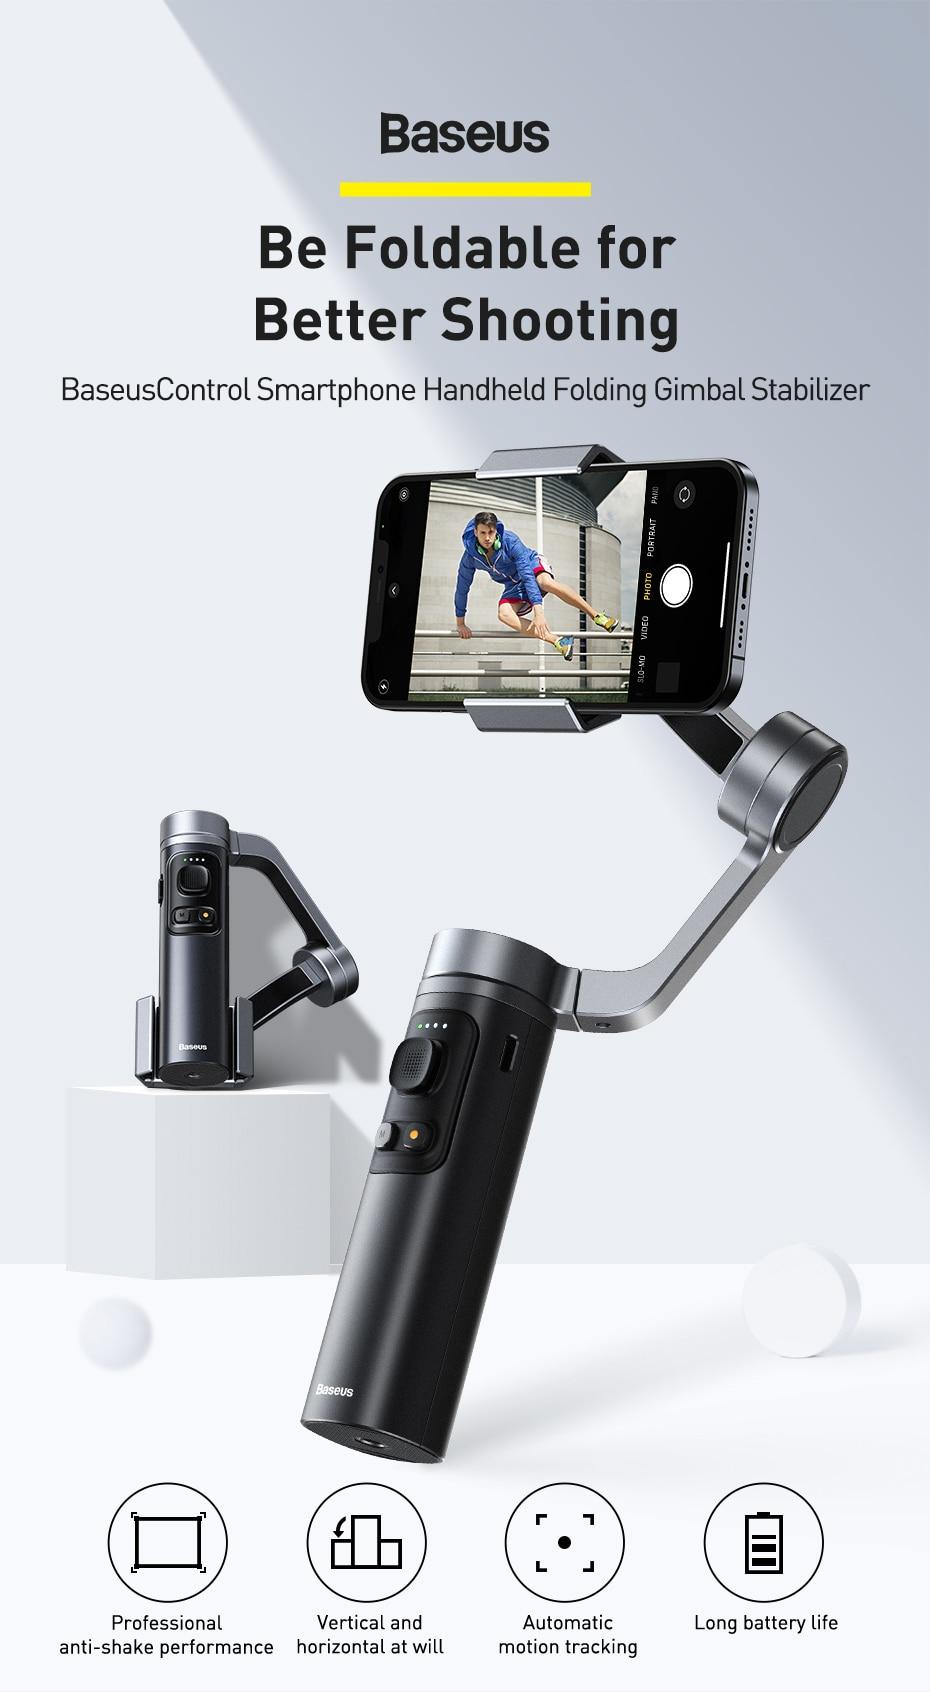 Baseus Control Smartphone Handheld Folding Gimbal Stabilizer 5